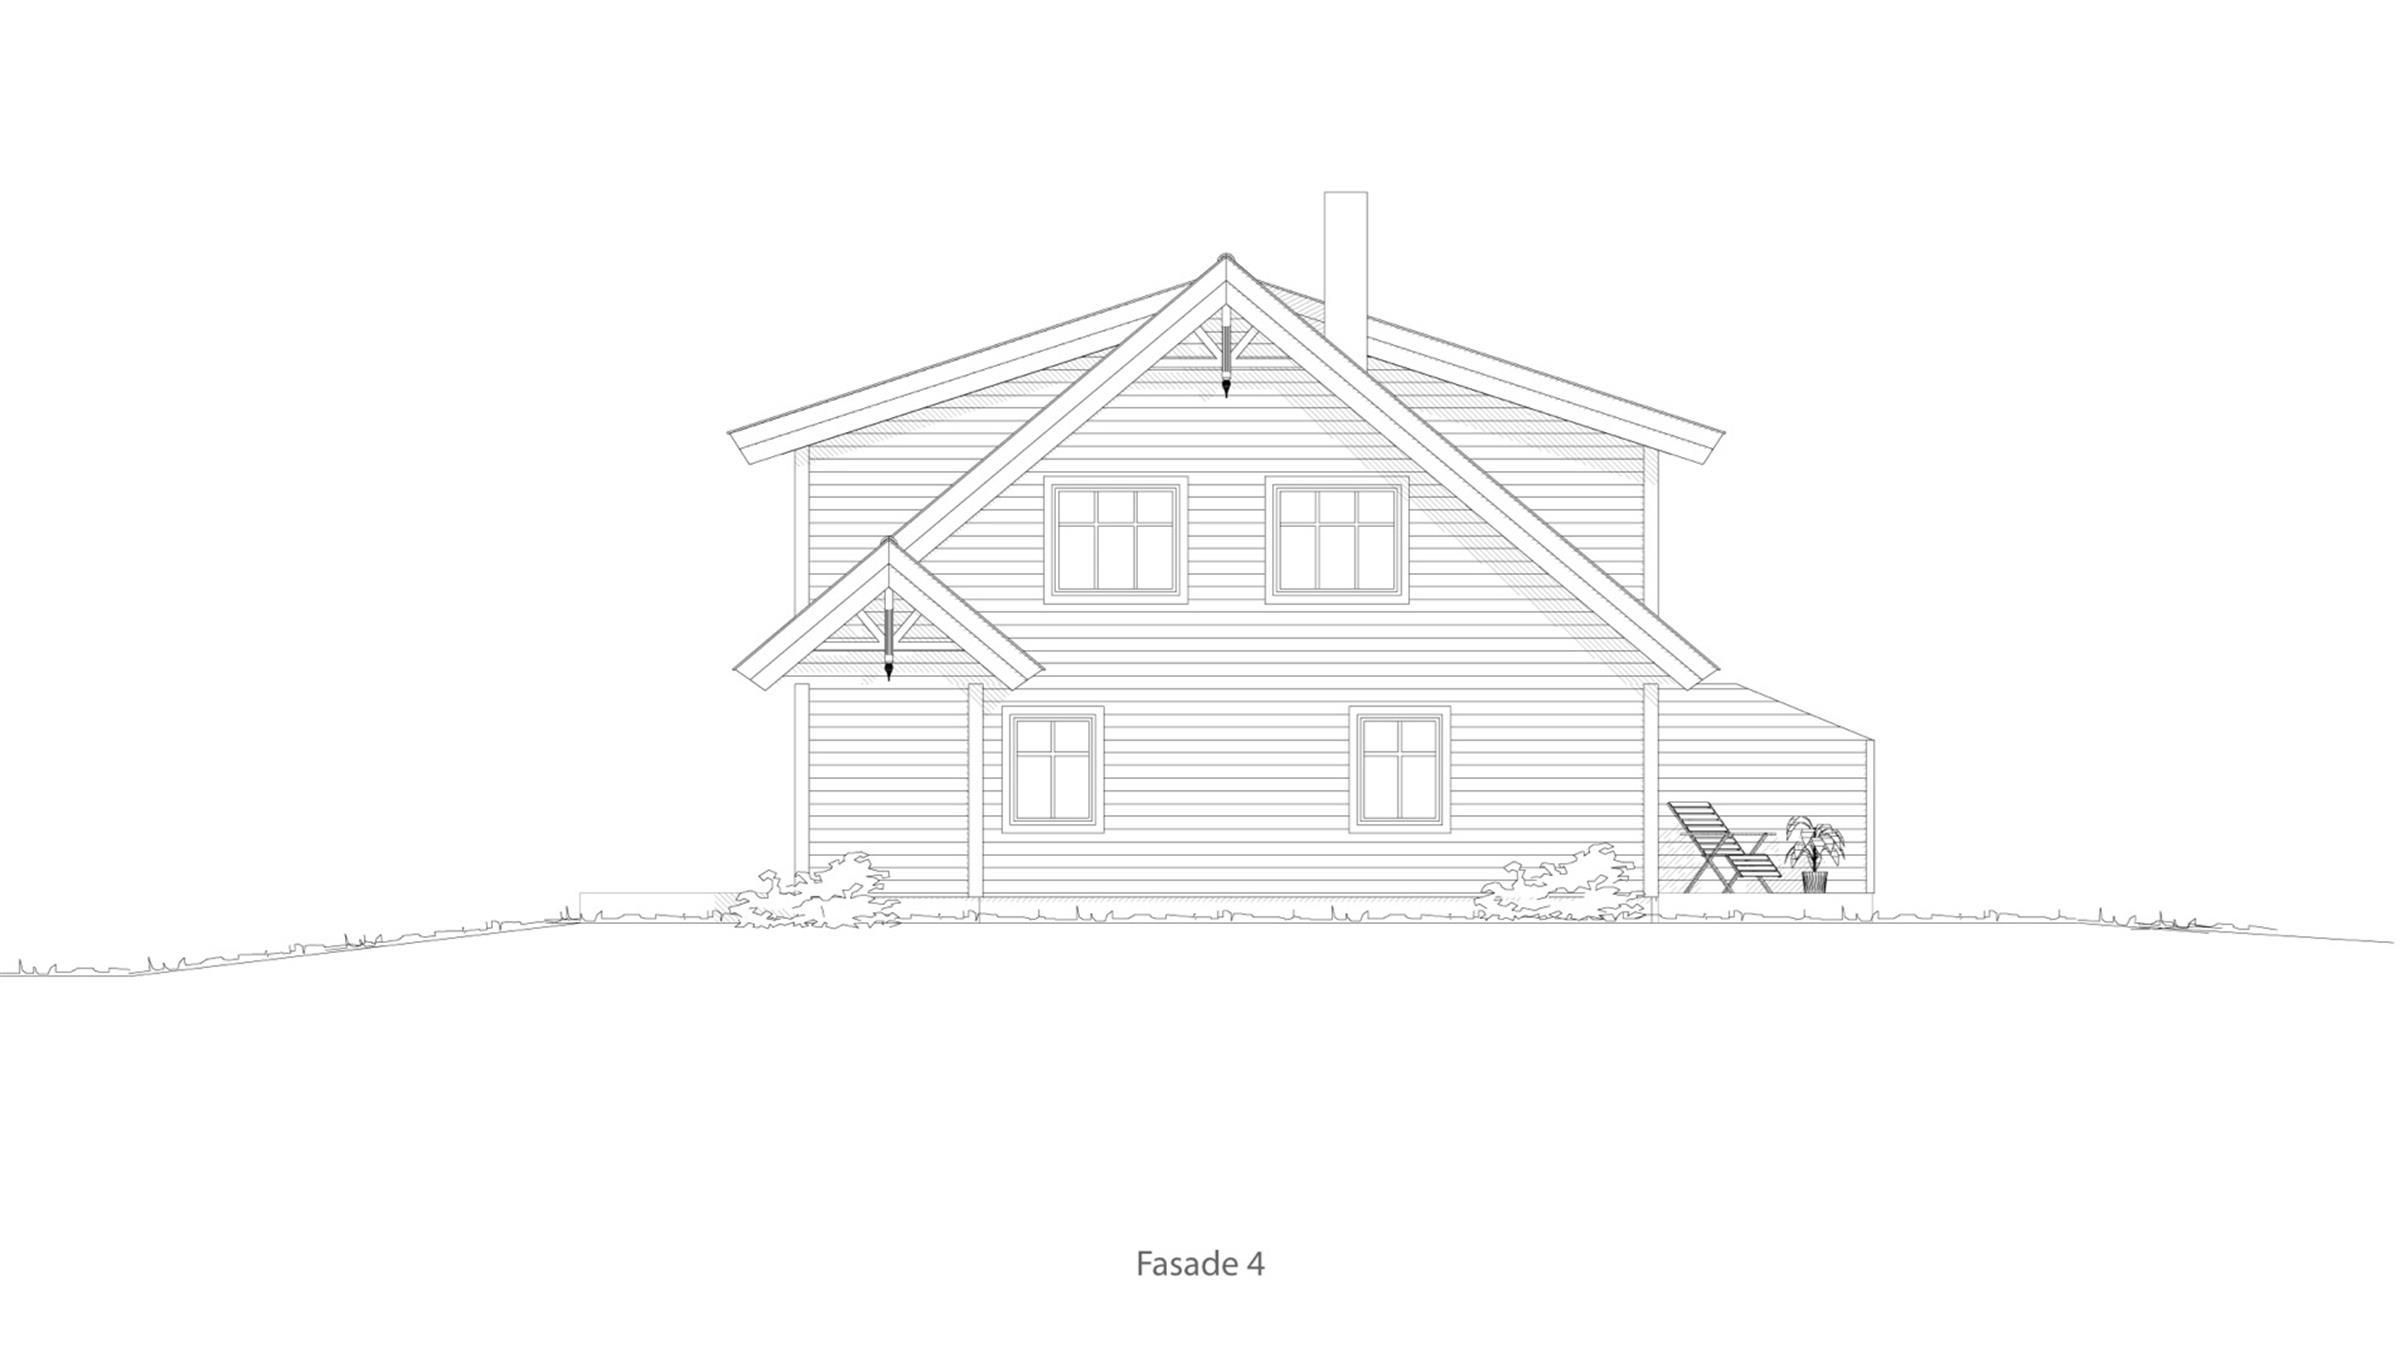 Elverum fasade 4